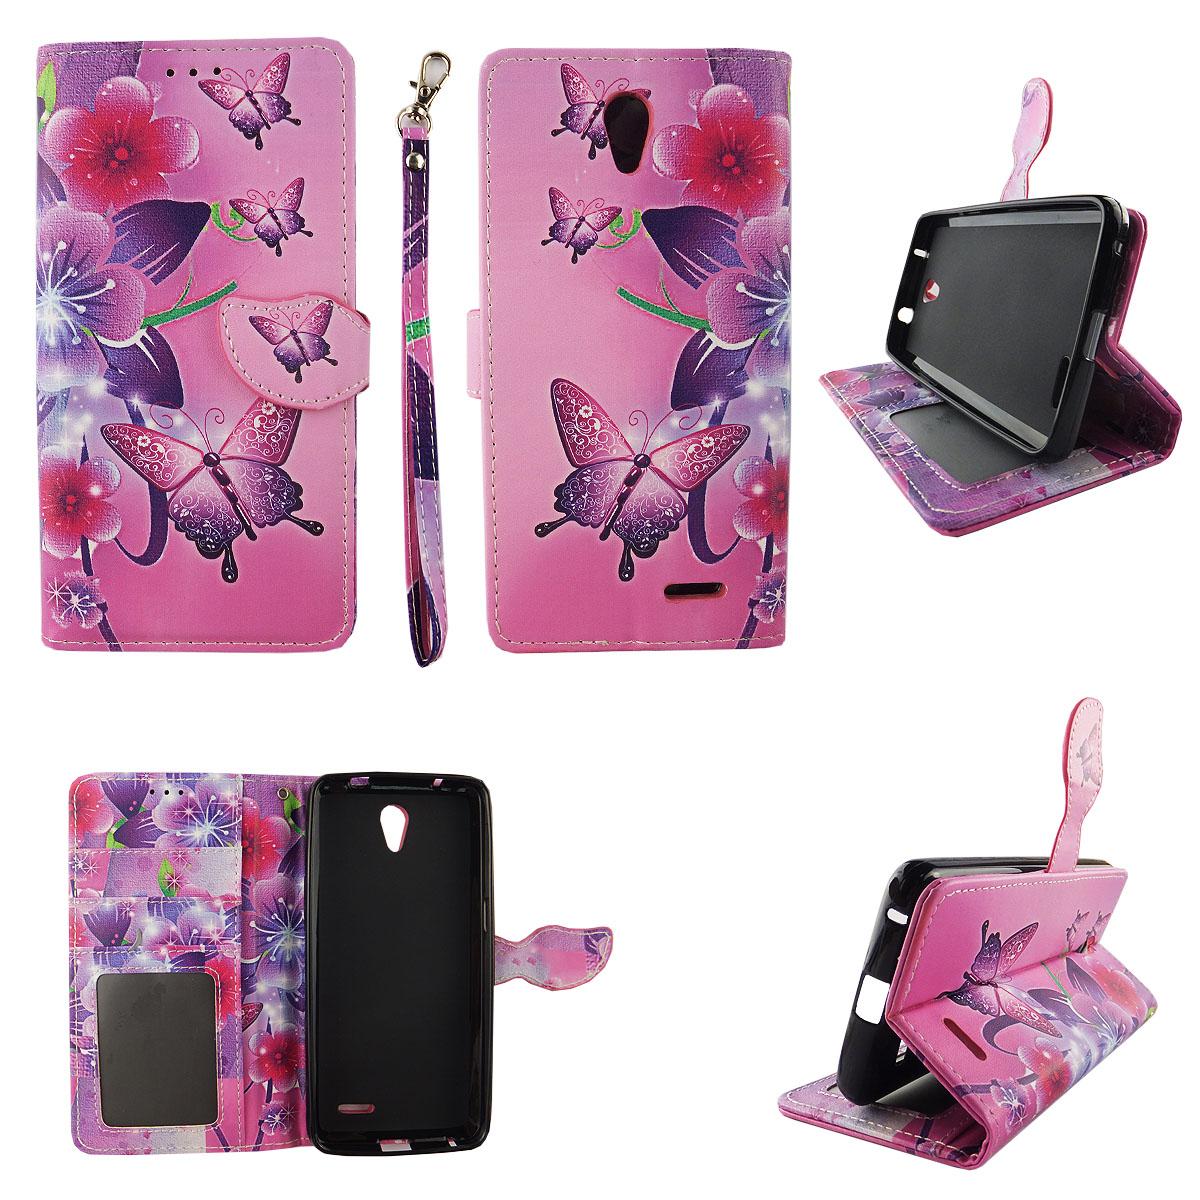 Butterfly Flower Pink Wallet Folio Case for ZTE Prestige Z9132 Avid Plus Z828 Fashion Flip PU Leather Cover Card Cash Slots & Stand